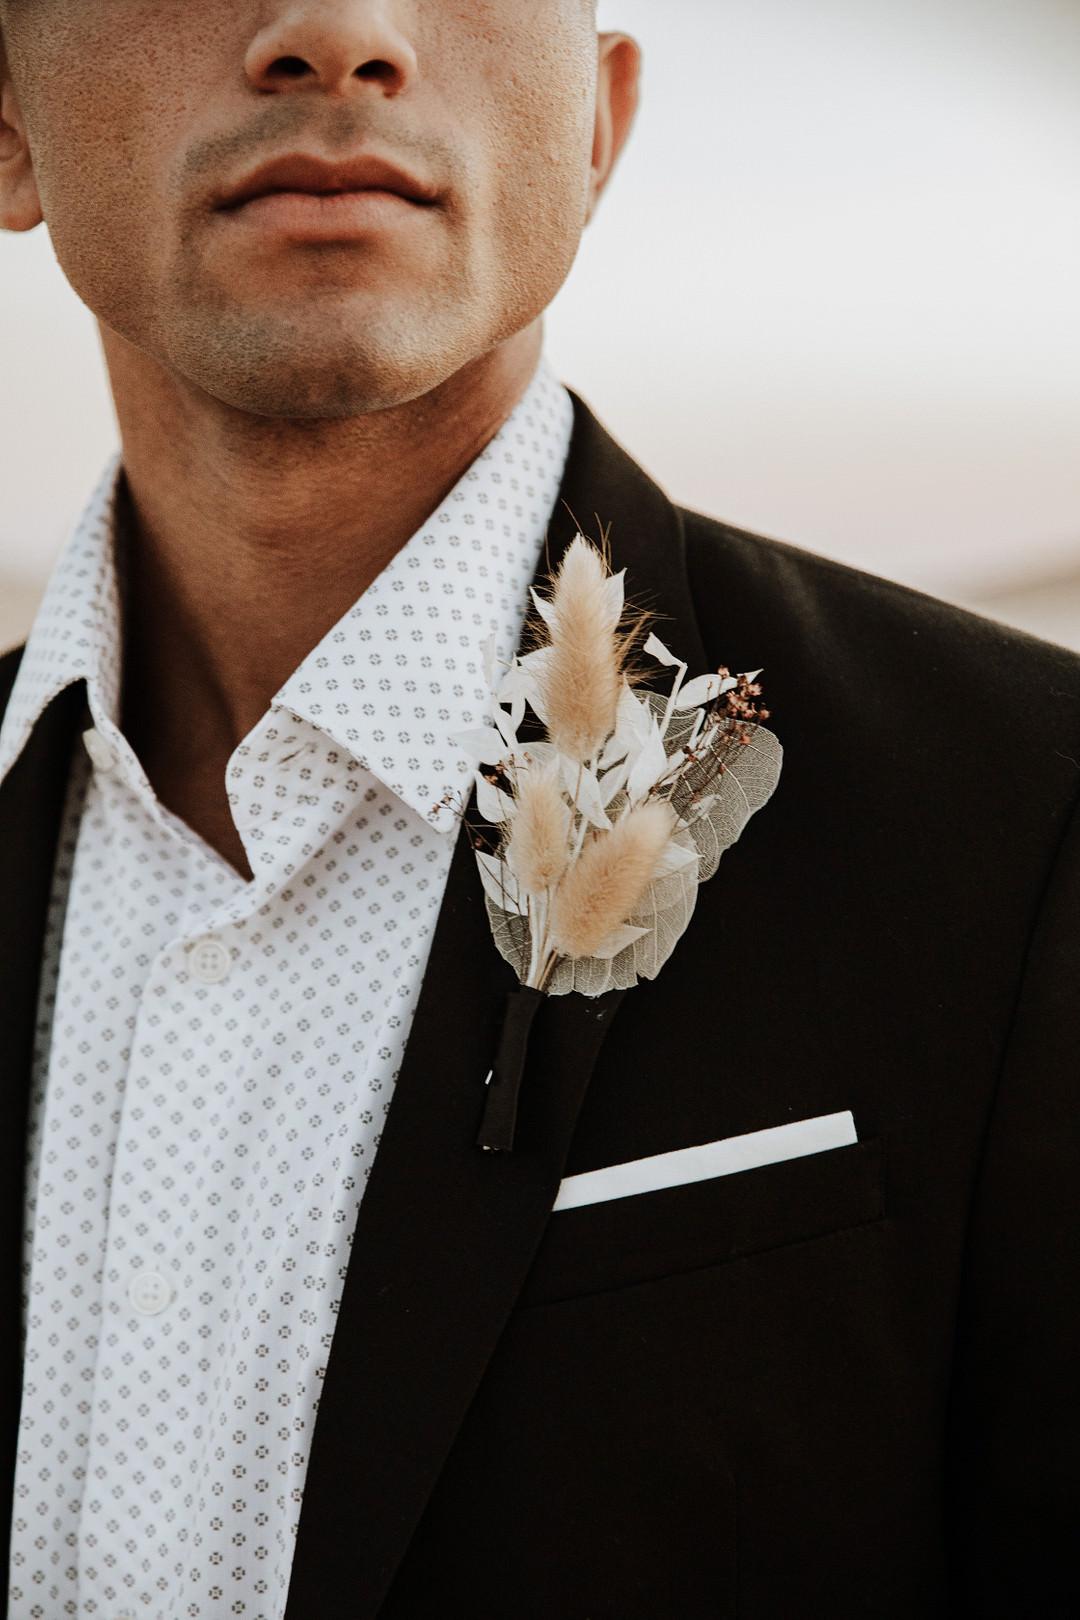 Groom Buttonhole Flowers Grass Sand Dunes Wedding Photos By Gayle